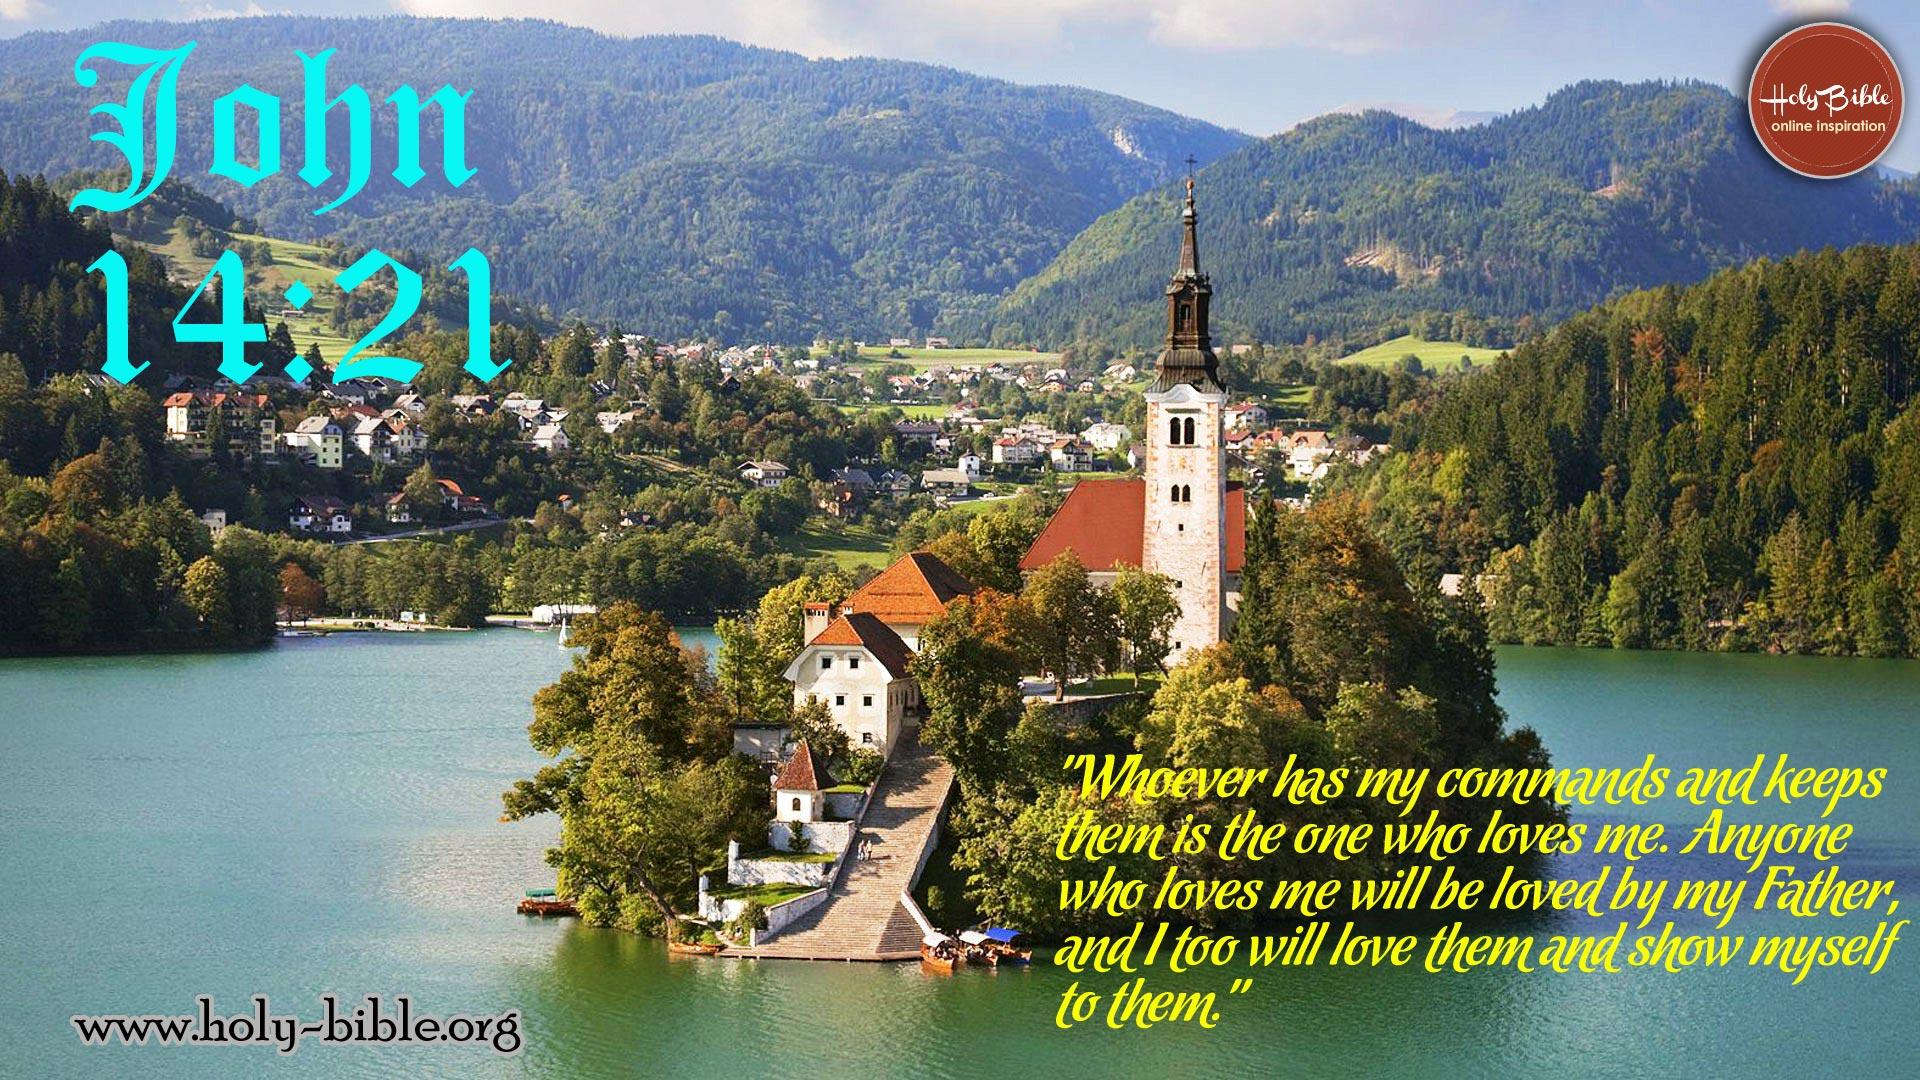 Bible Verse of the day – John 14:21